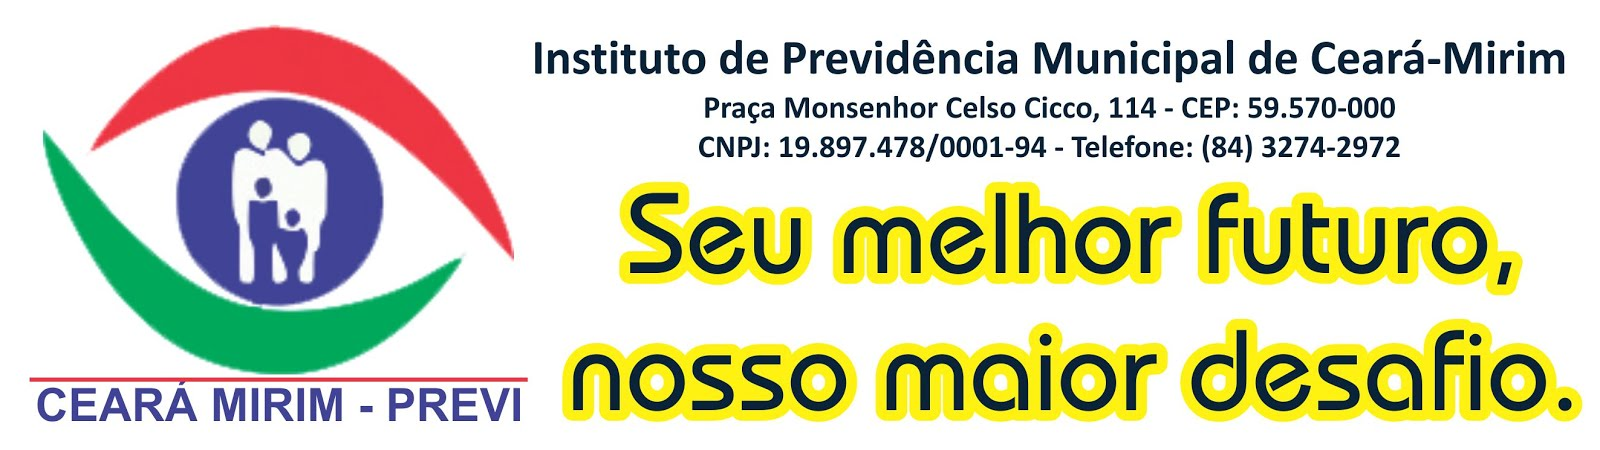 Ceará-Mirim PREVI